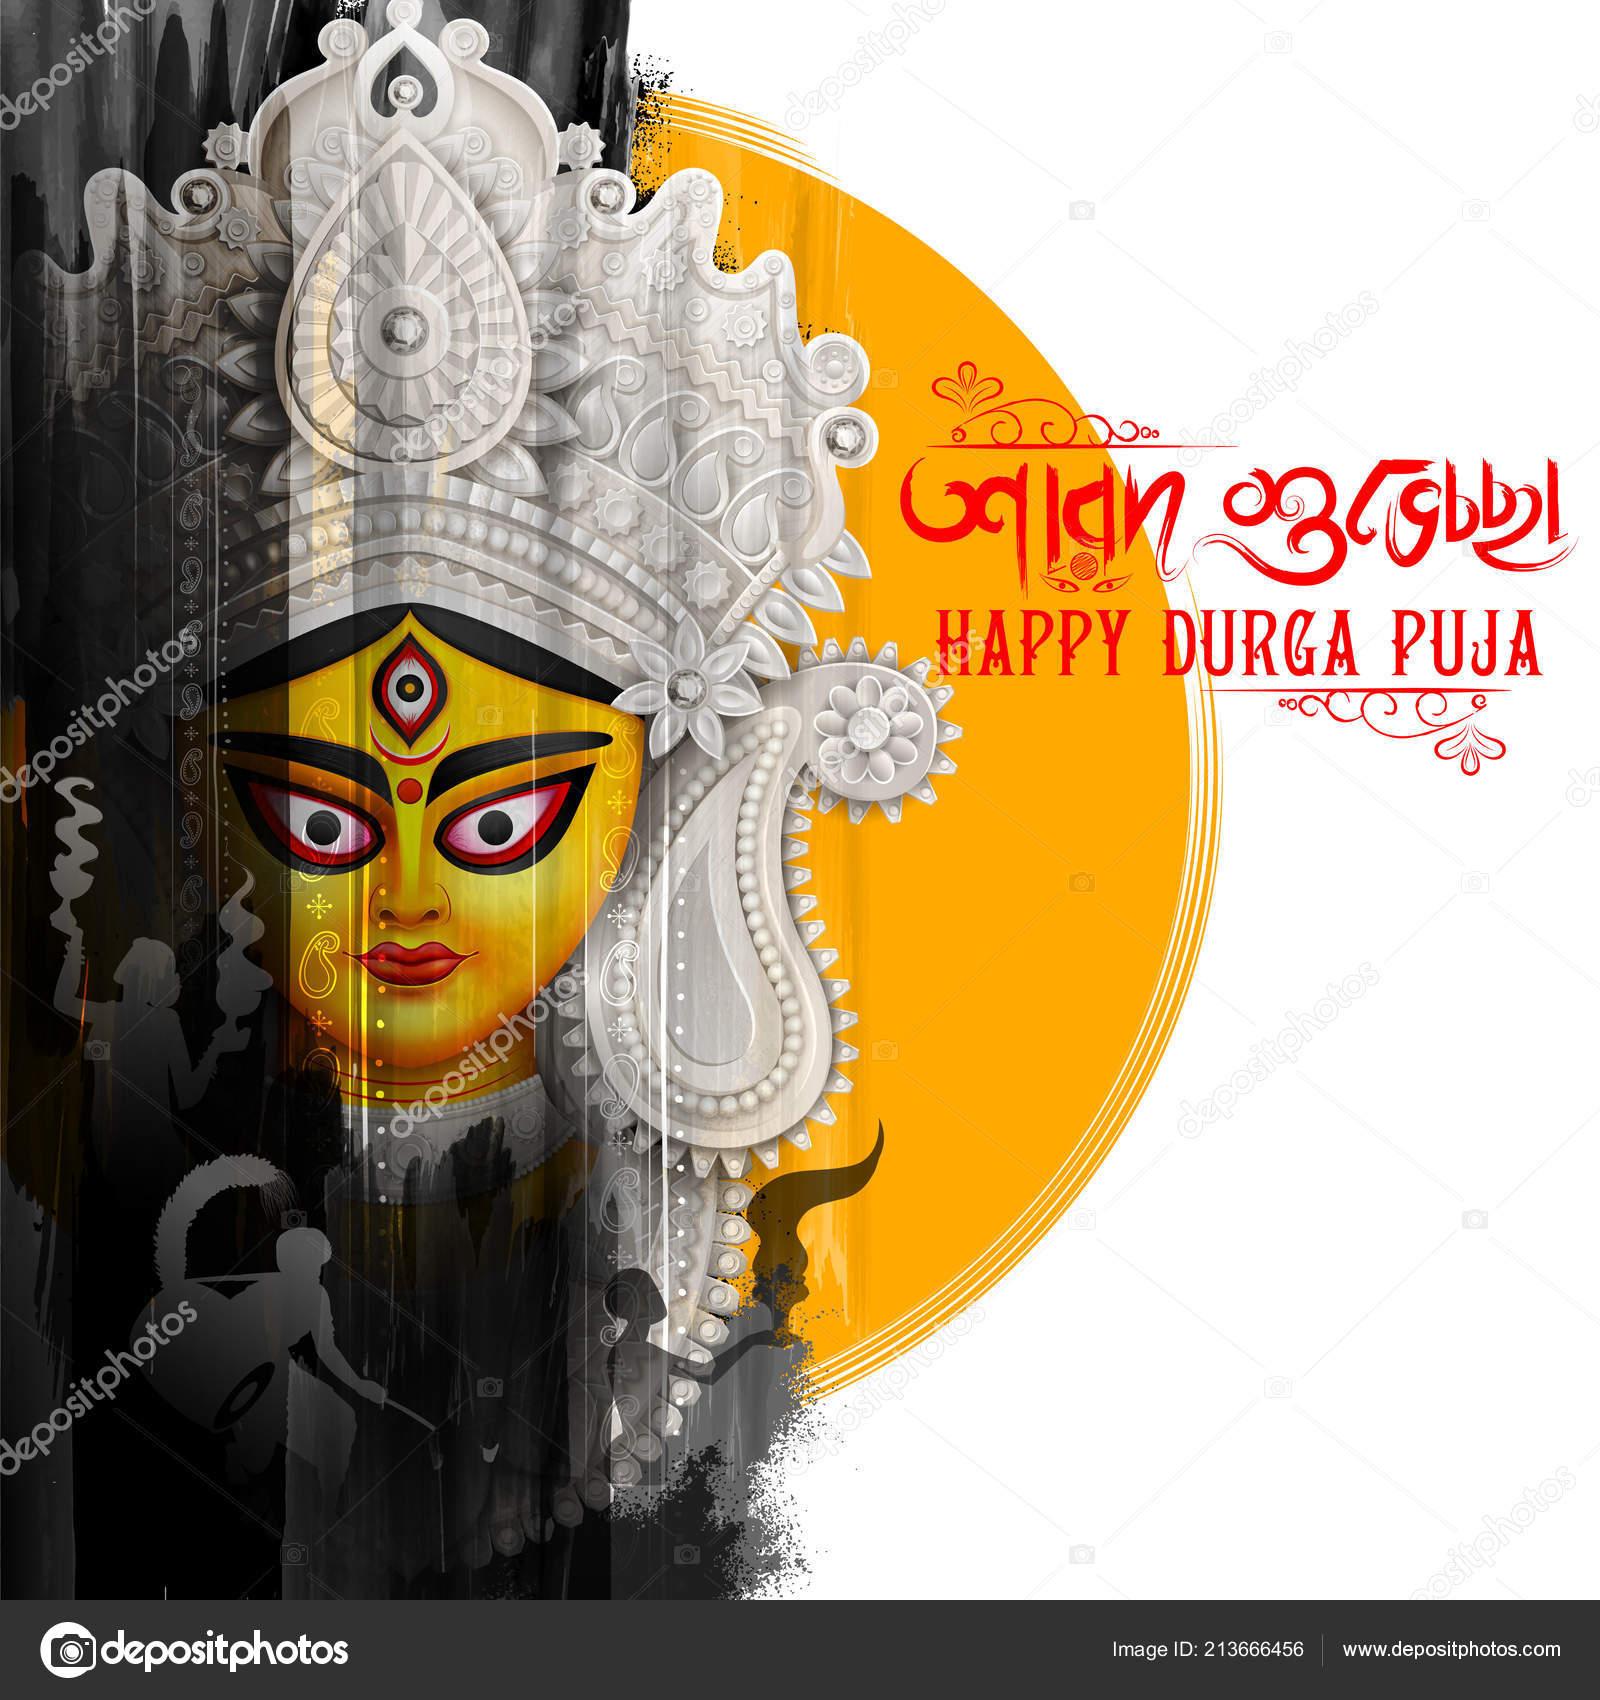 Sharod shubhechha | Goddess Durga in Happy Dussehra